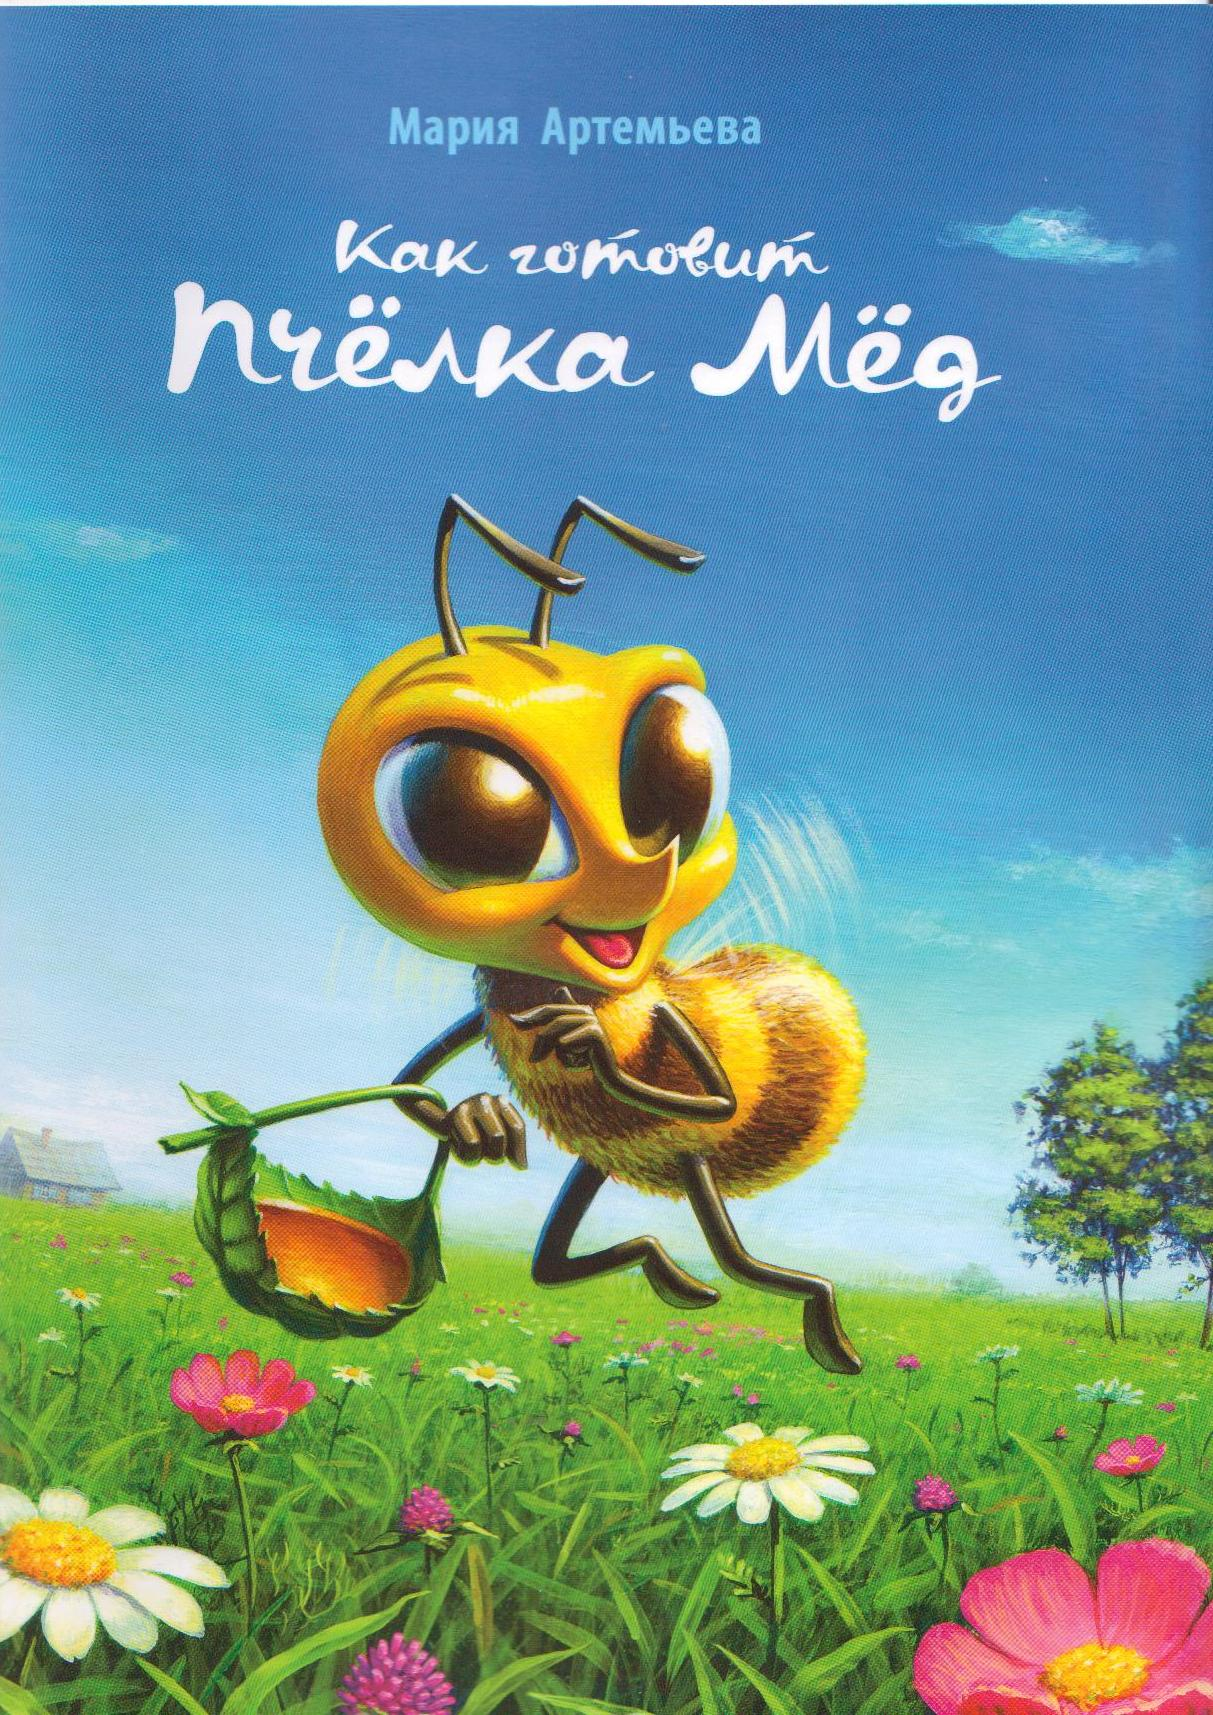 Как готовит пчелка мед.